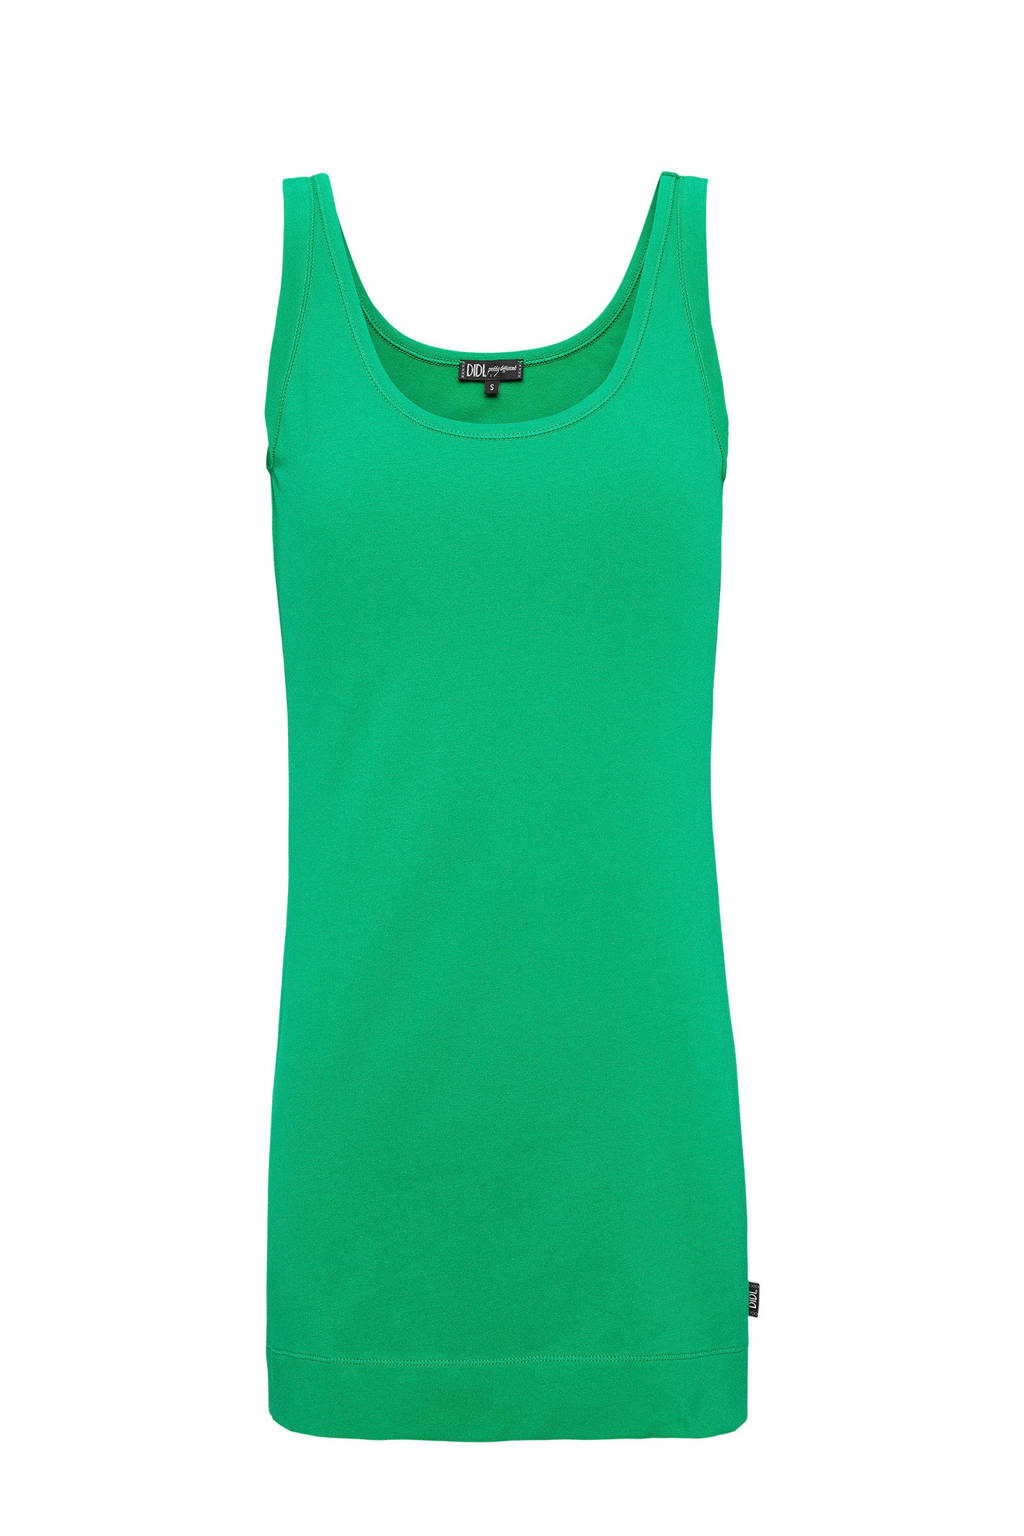 Didi singlet groen, Groen